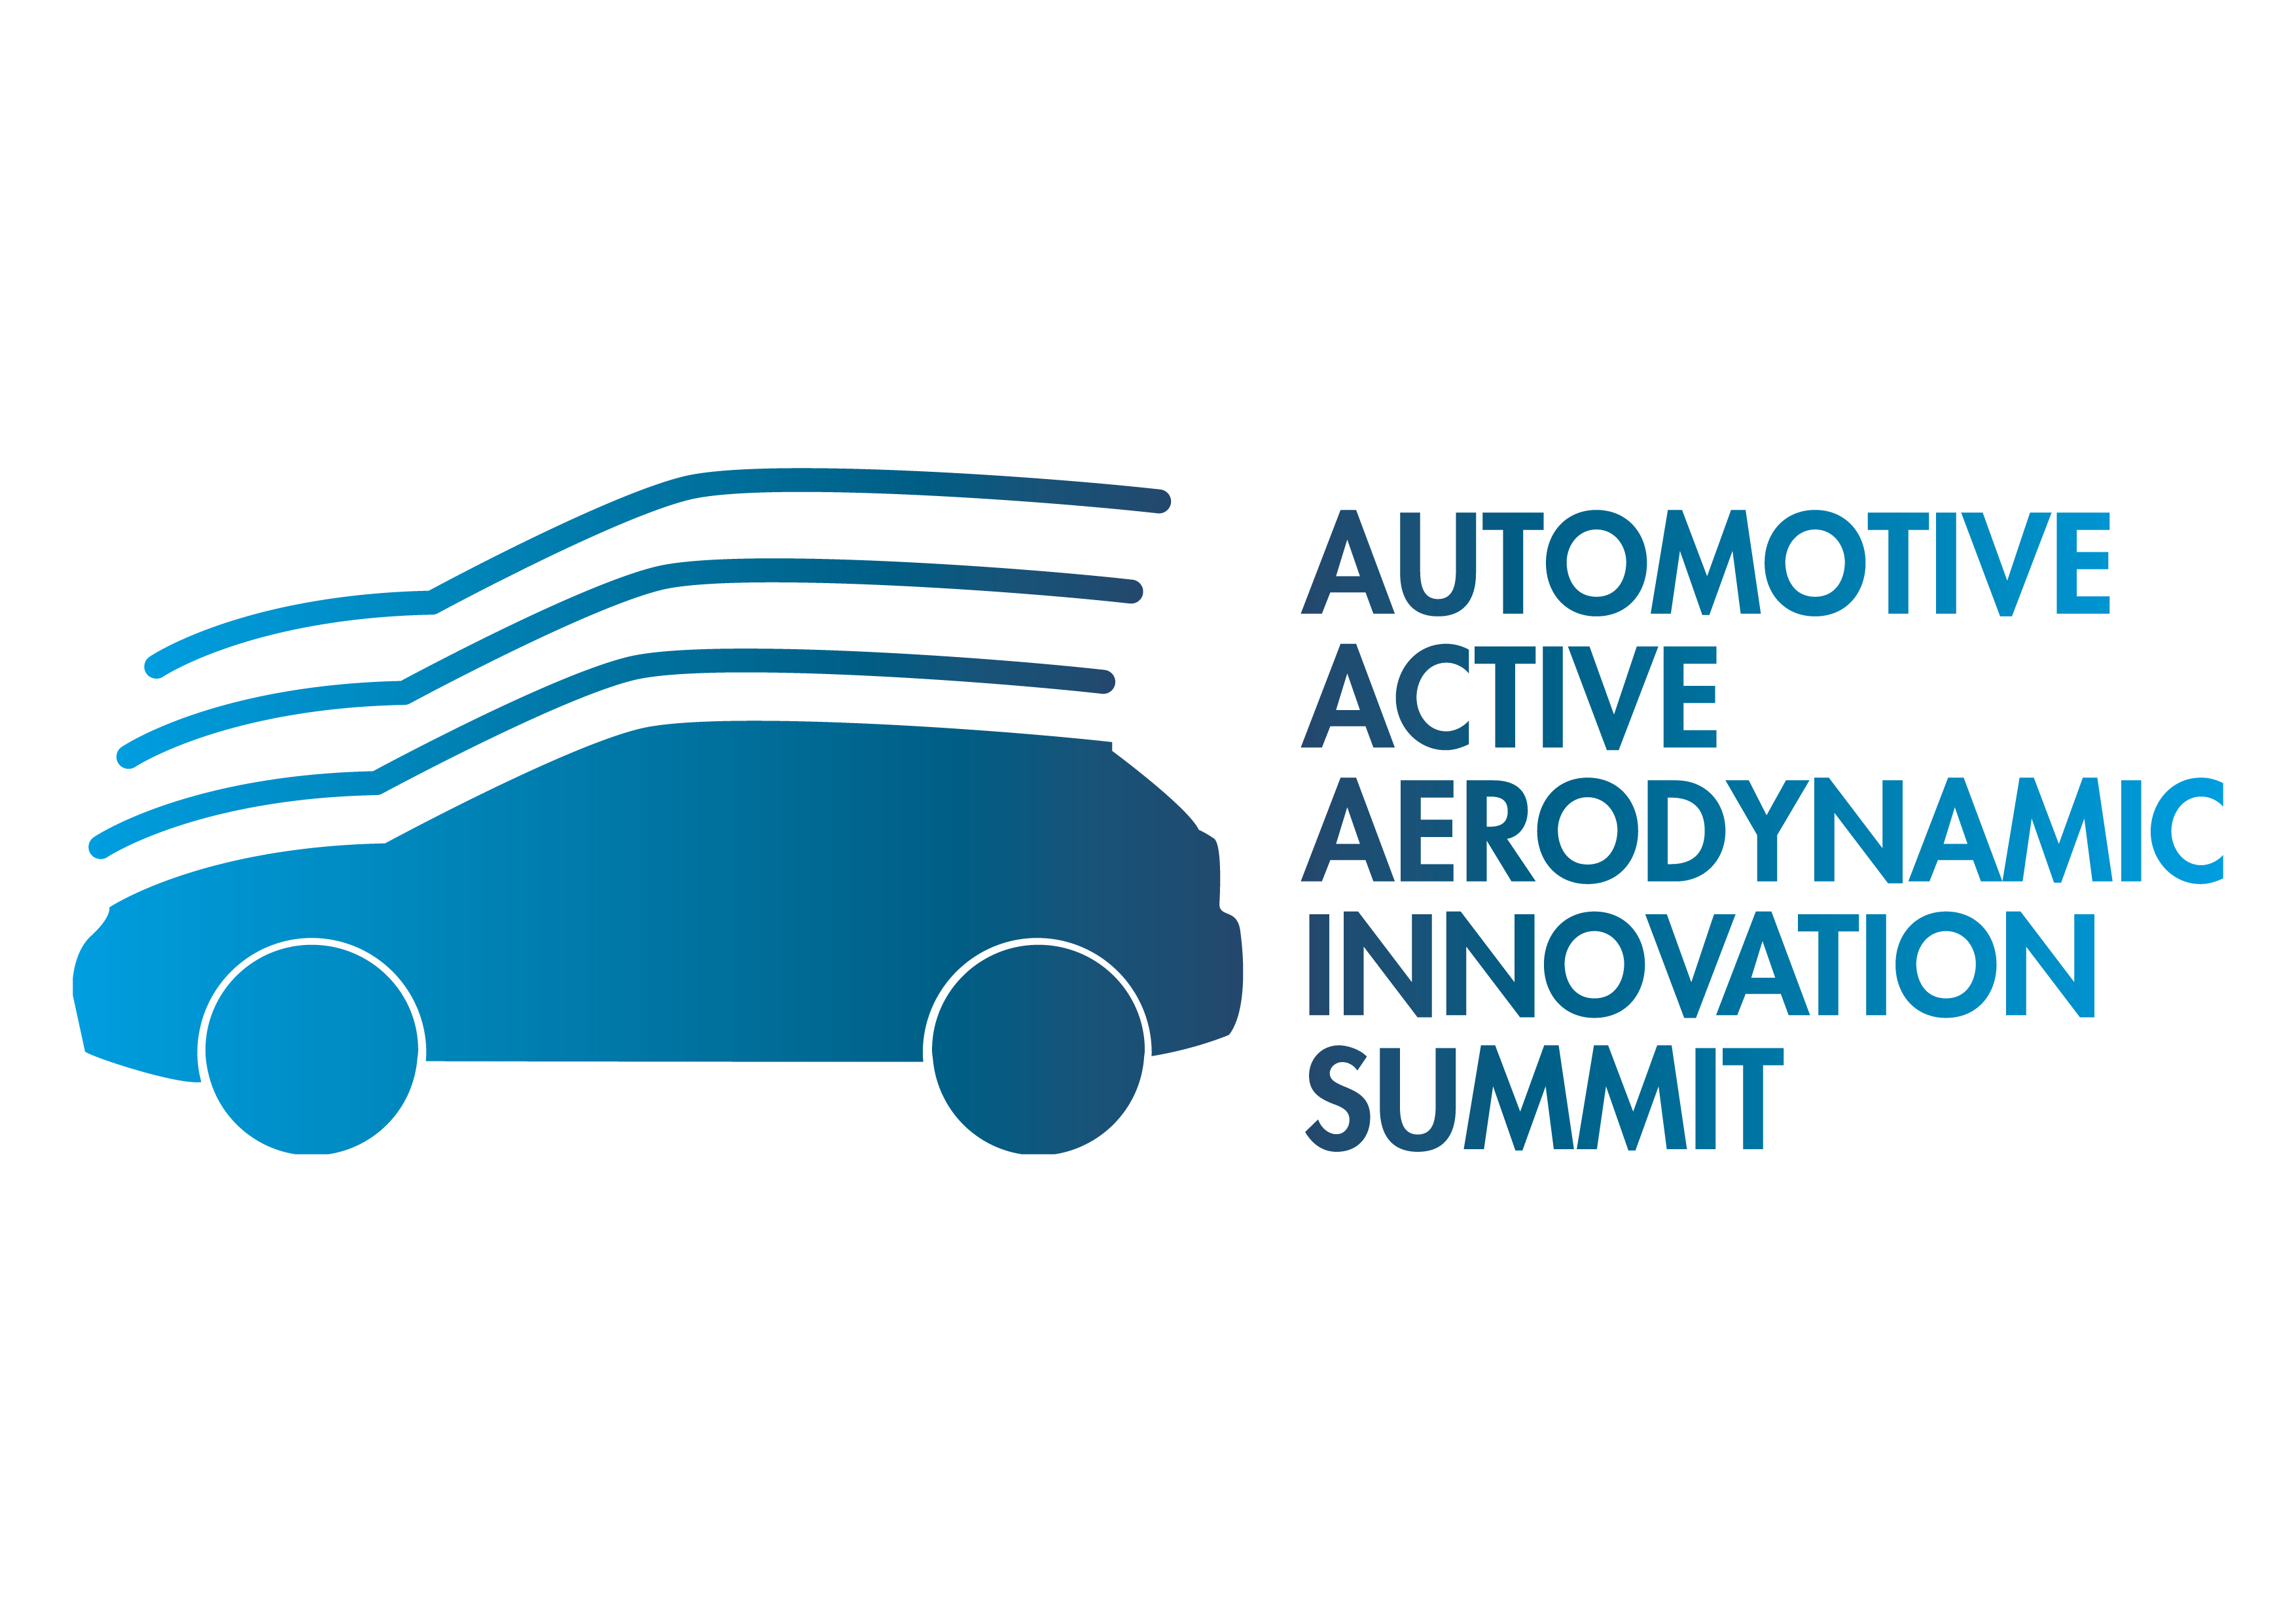 BATZ Automotive Active Aerodynamic Innovation Summit 2018